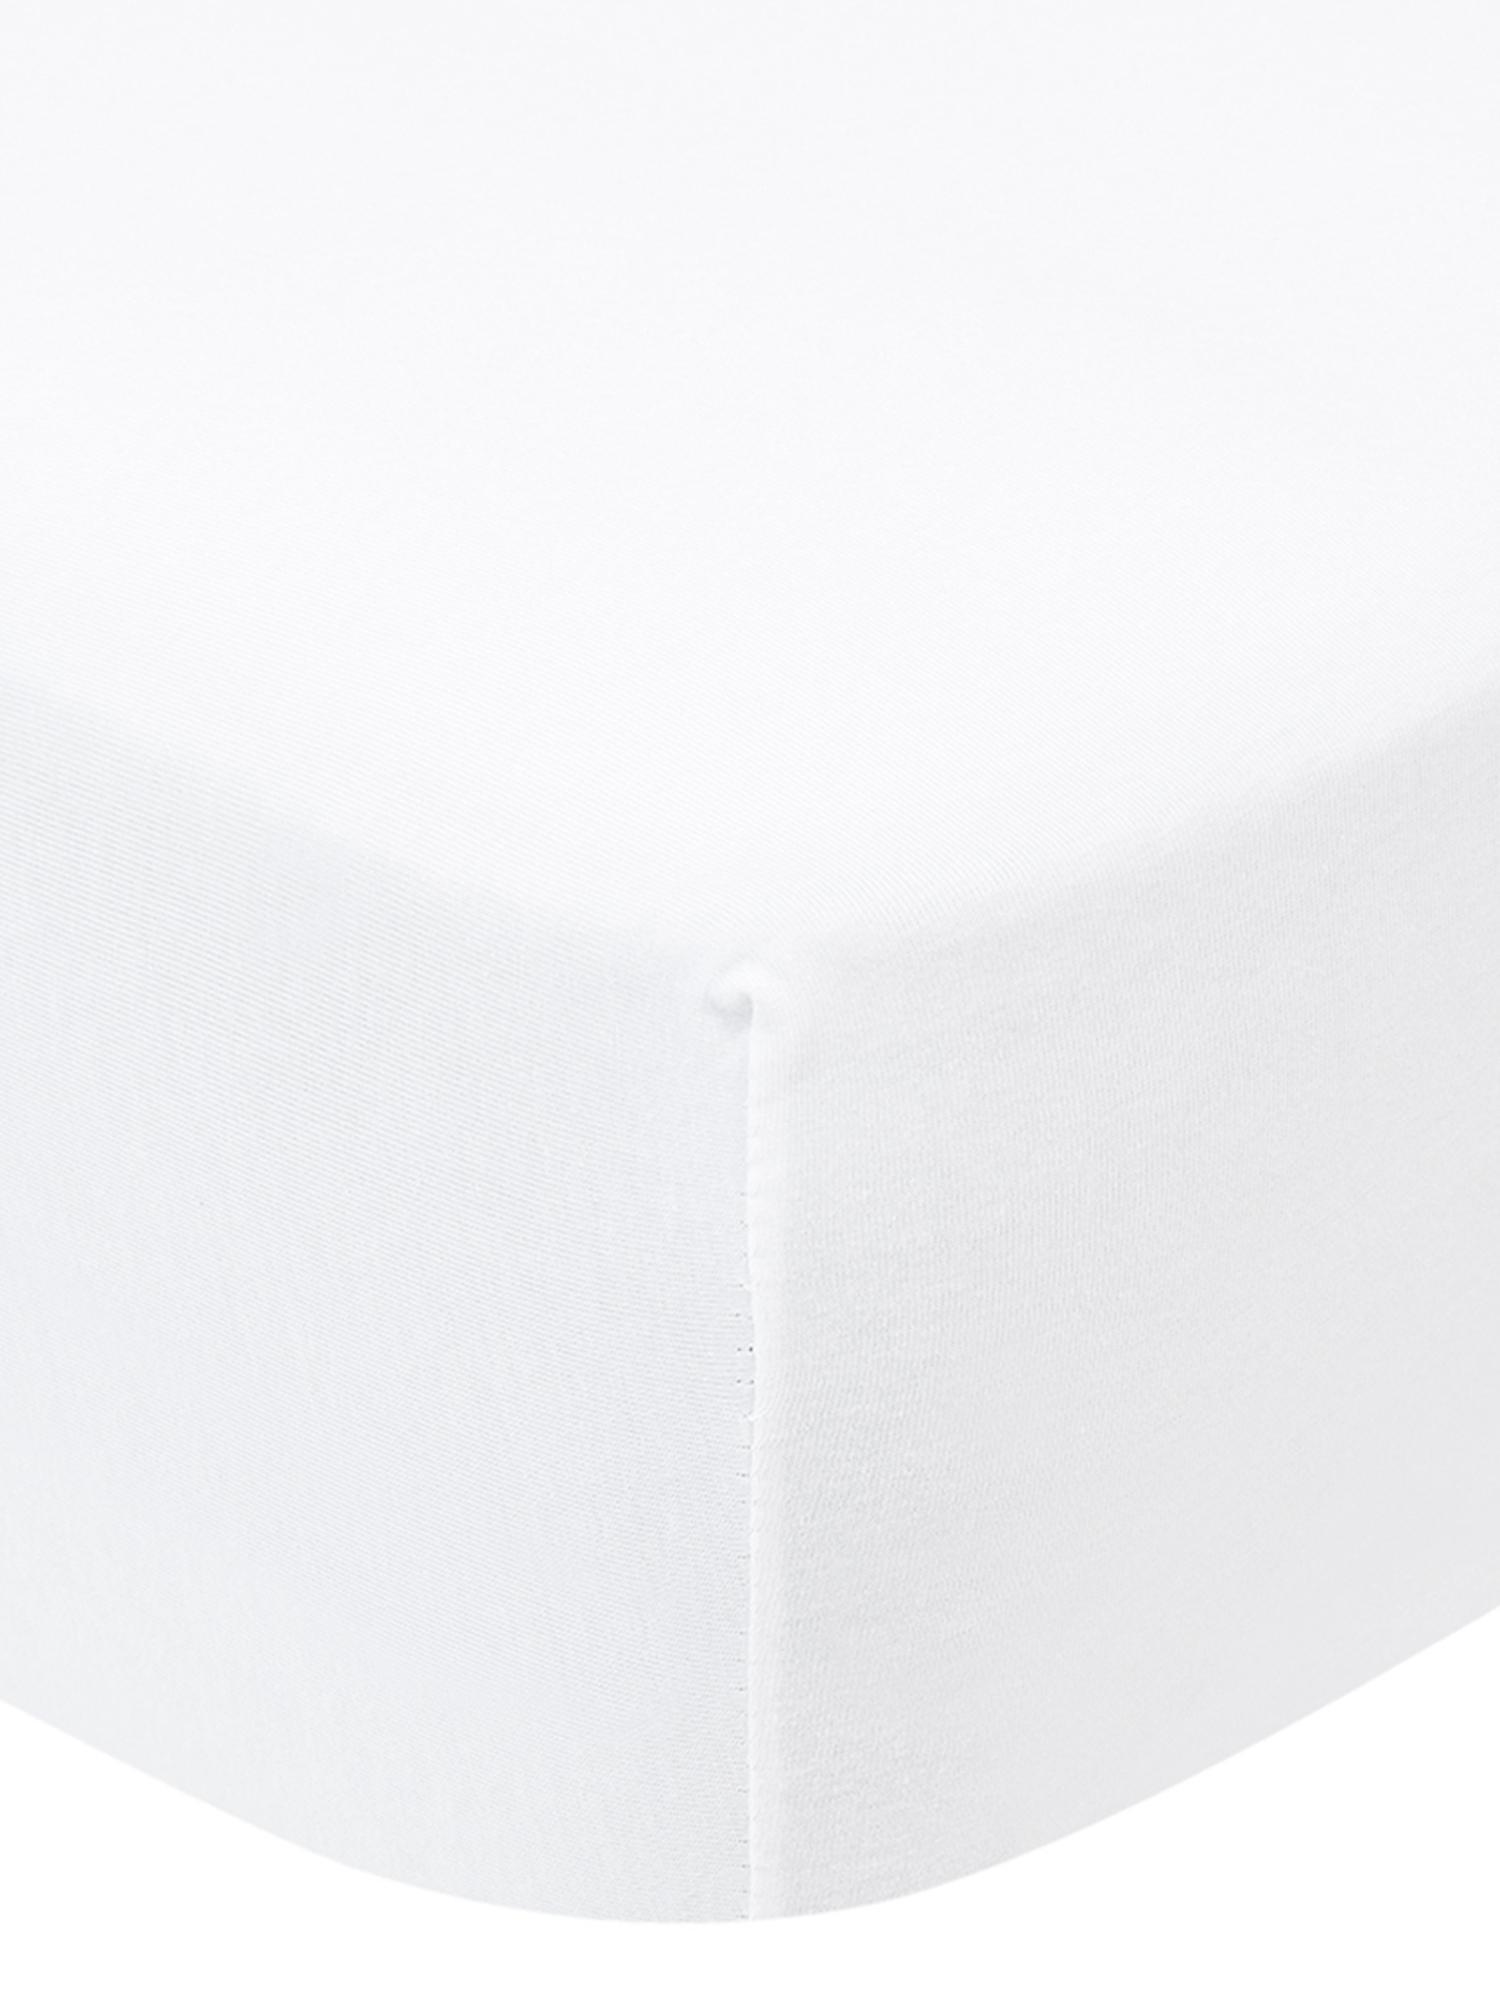 Sábana bajera de jersey con elastano Lara, 95%algodón, 5%elastano, Blanco, Cama 135/140 cm (140 x 200 cm)